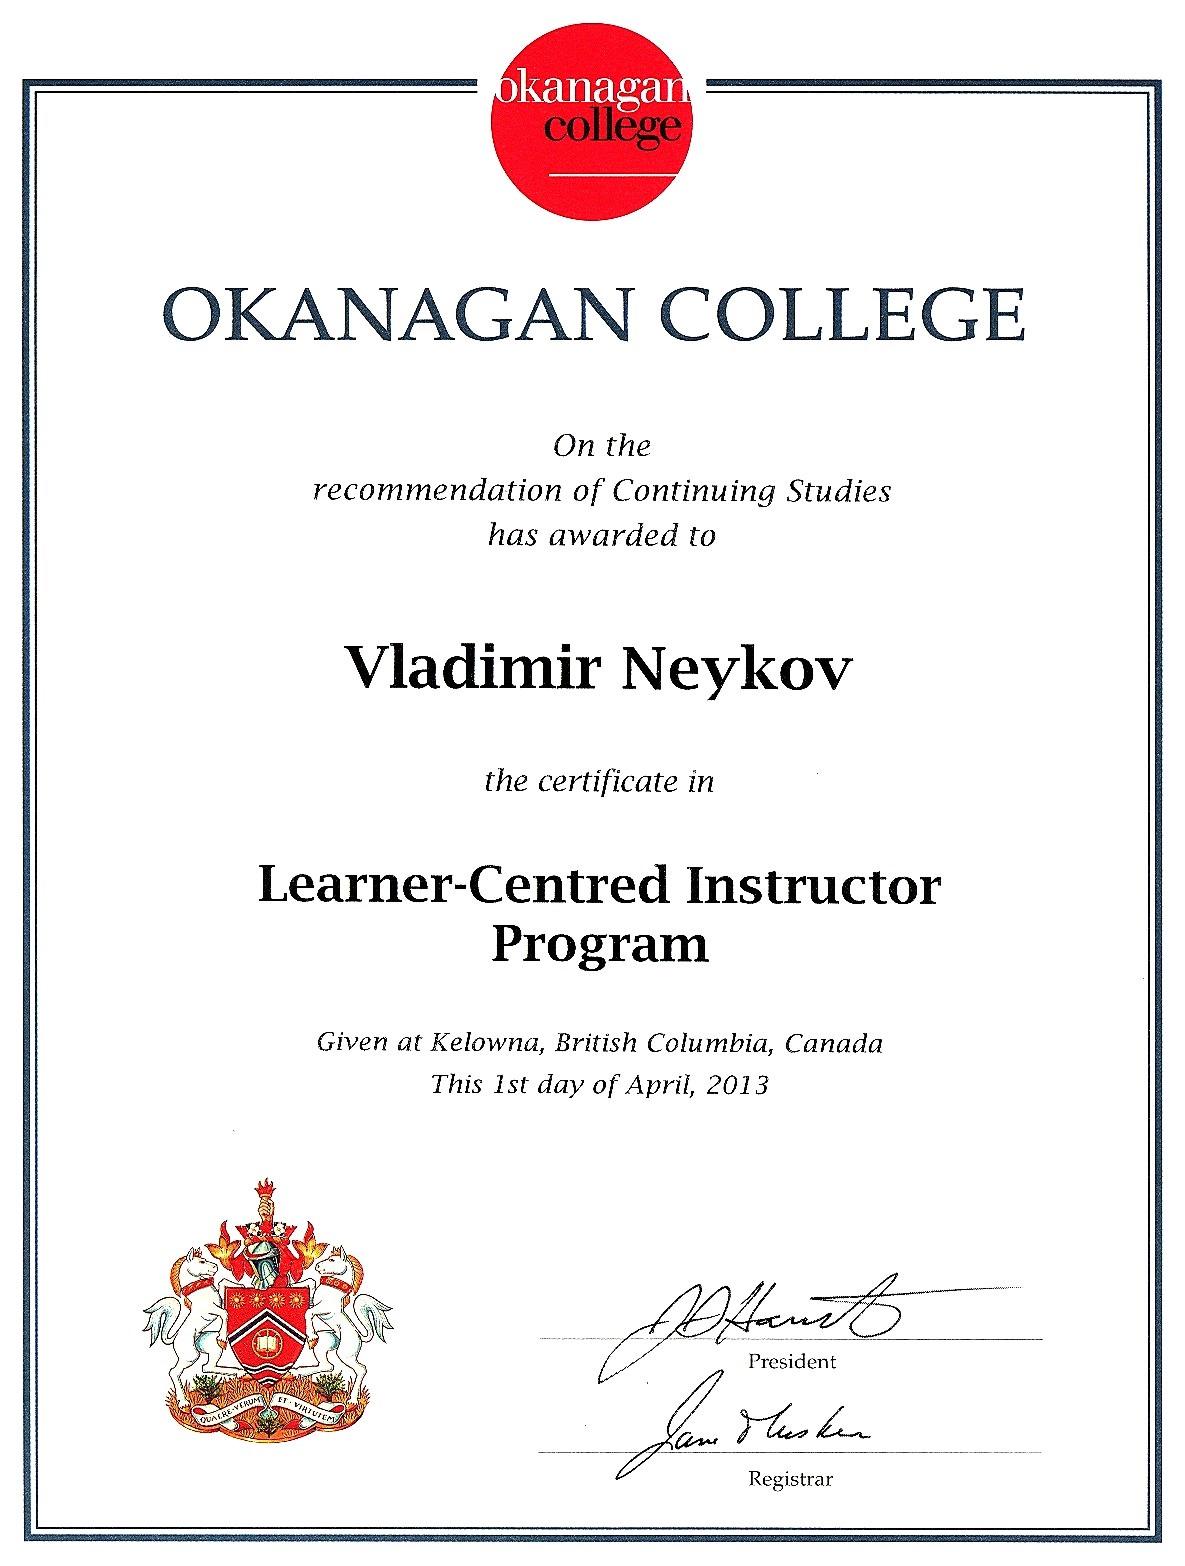 Okanagan College